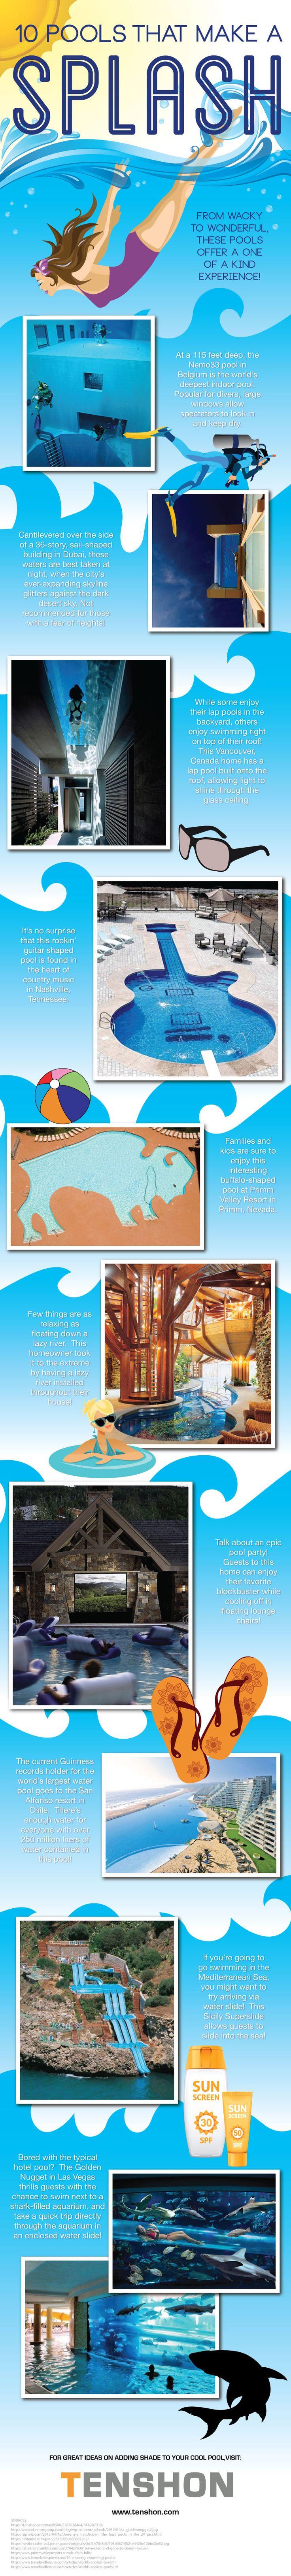 10 Pools That Make a Splash